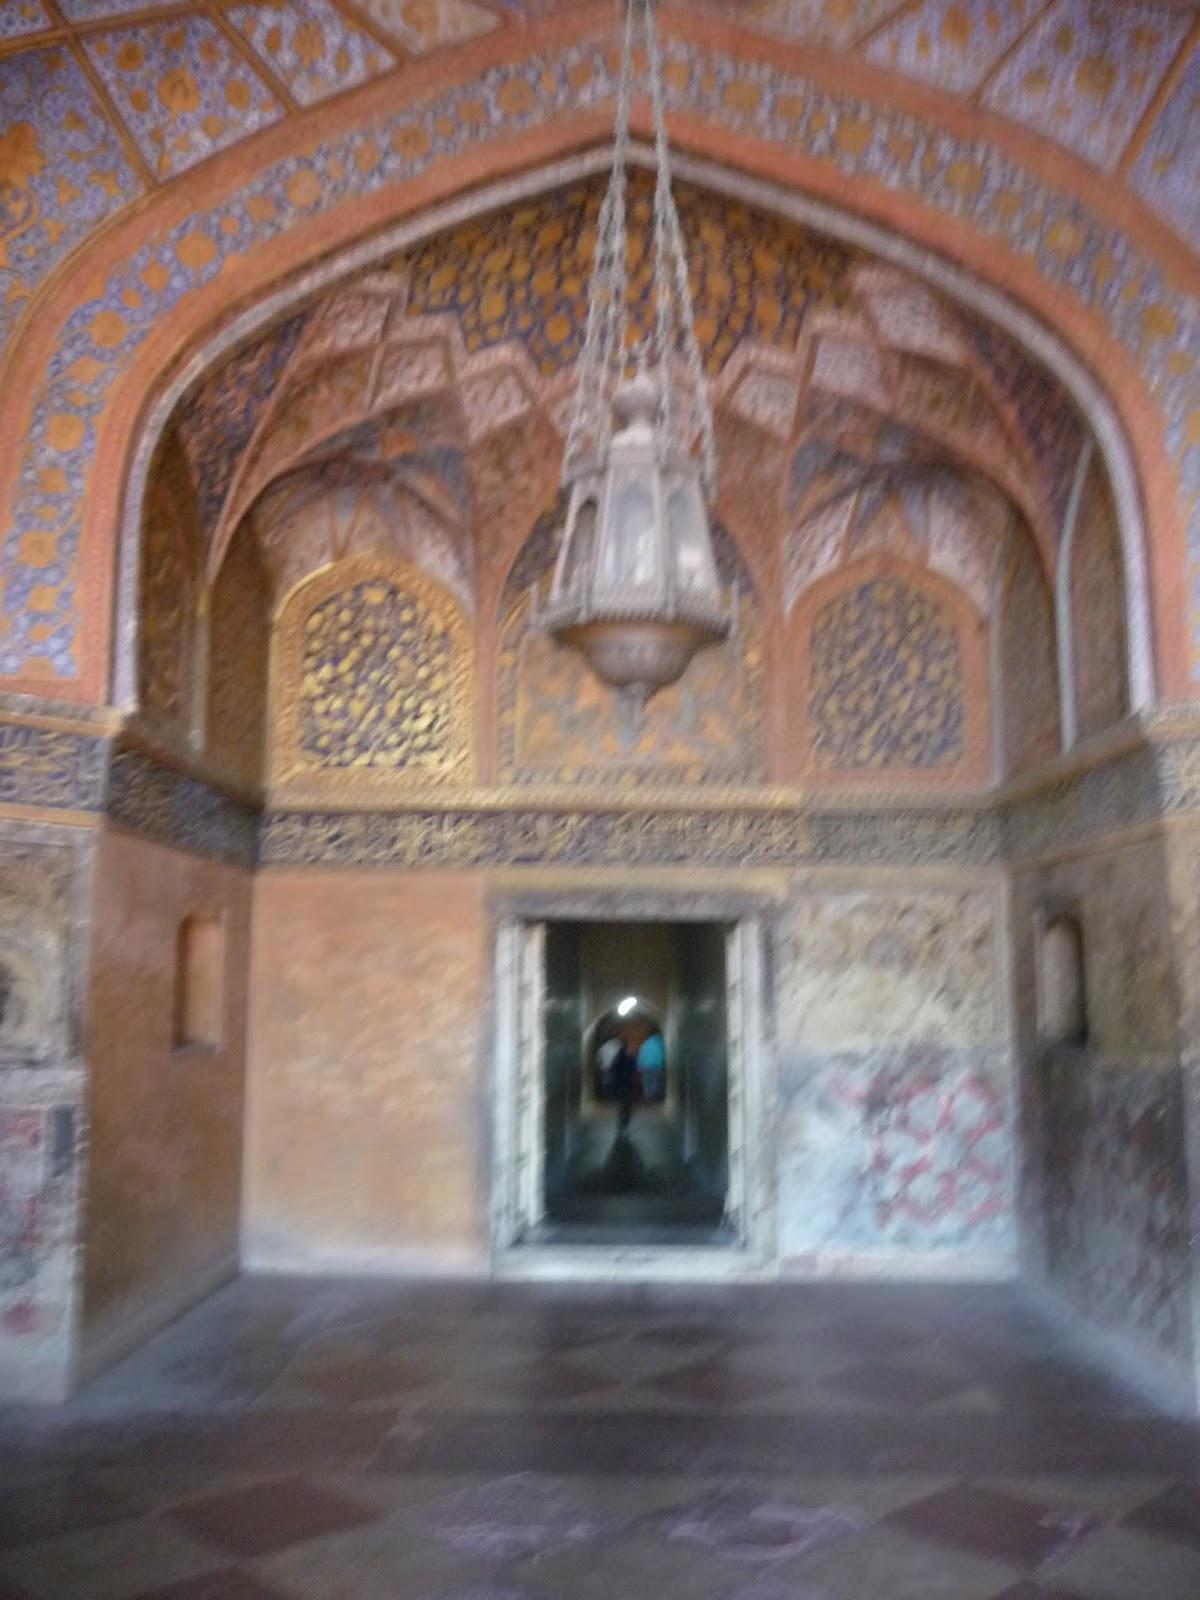 Akbar S Tomb At Sikandra Near Agra In Uttar Pradesh The